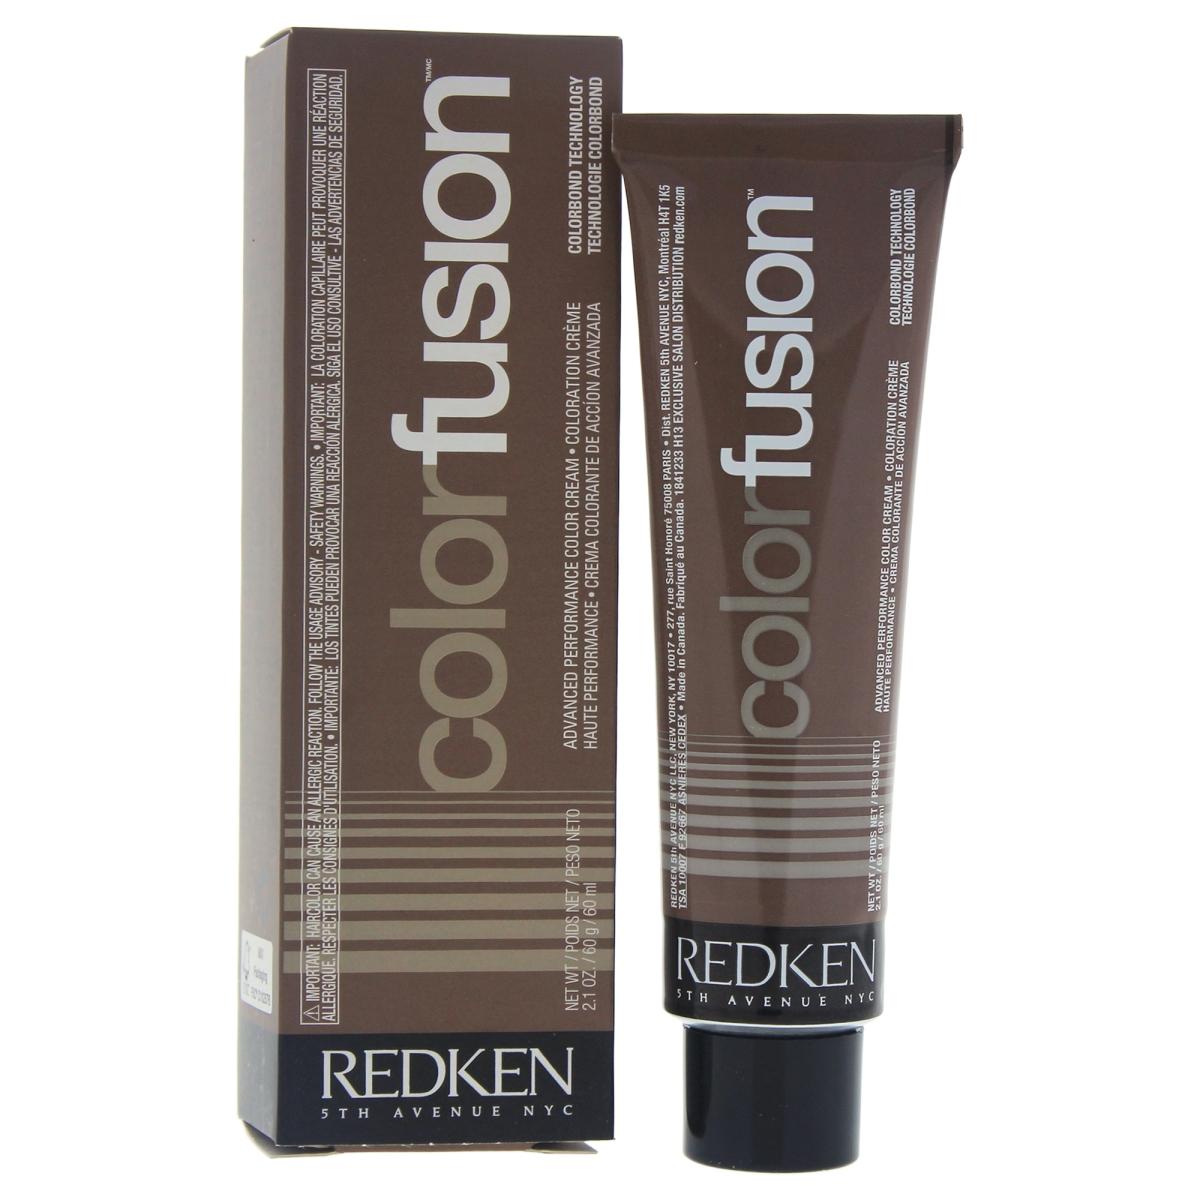 Redken U-HC-11732 2.1 oz Color Fusion Cream No. 9 Natural Balance Hair Color for Unisex Gold Beige